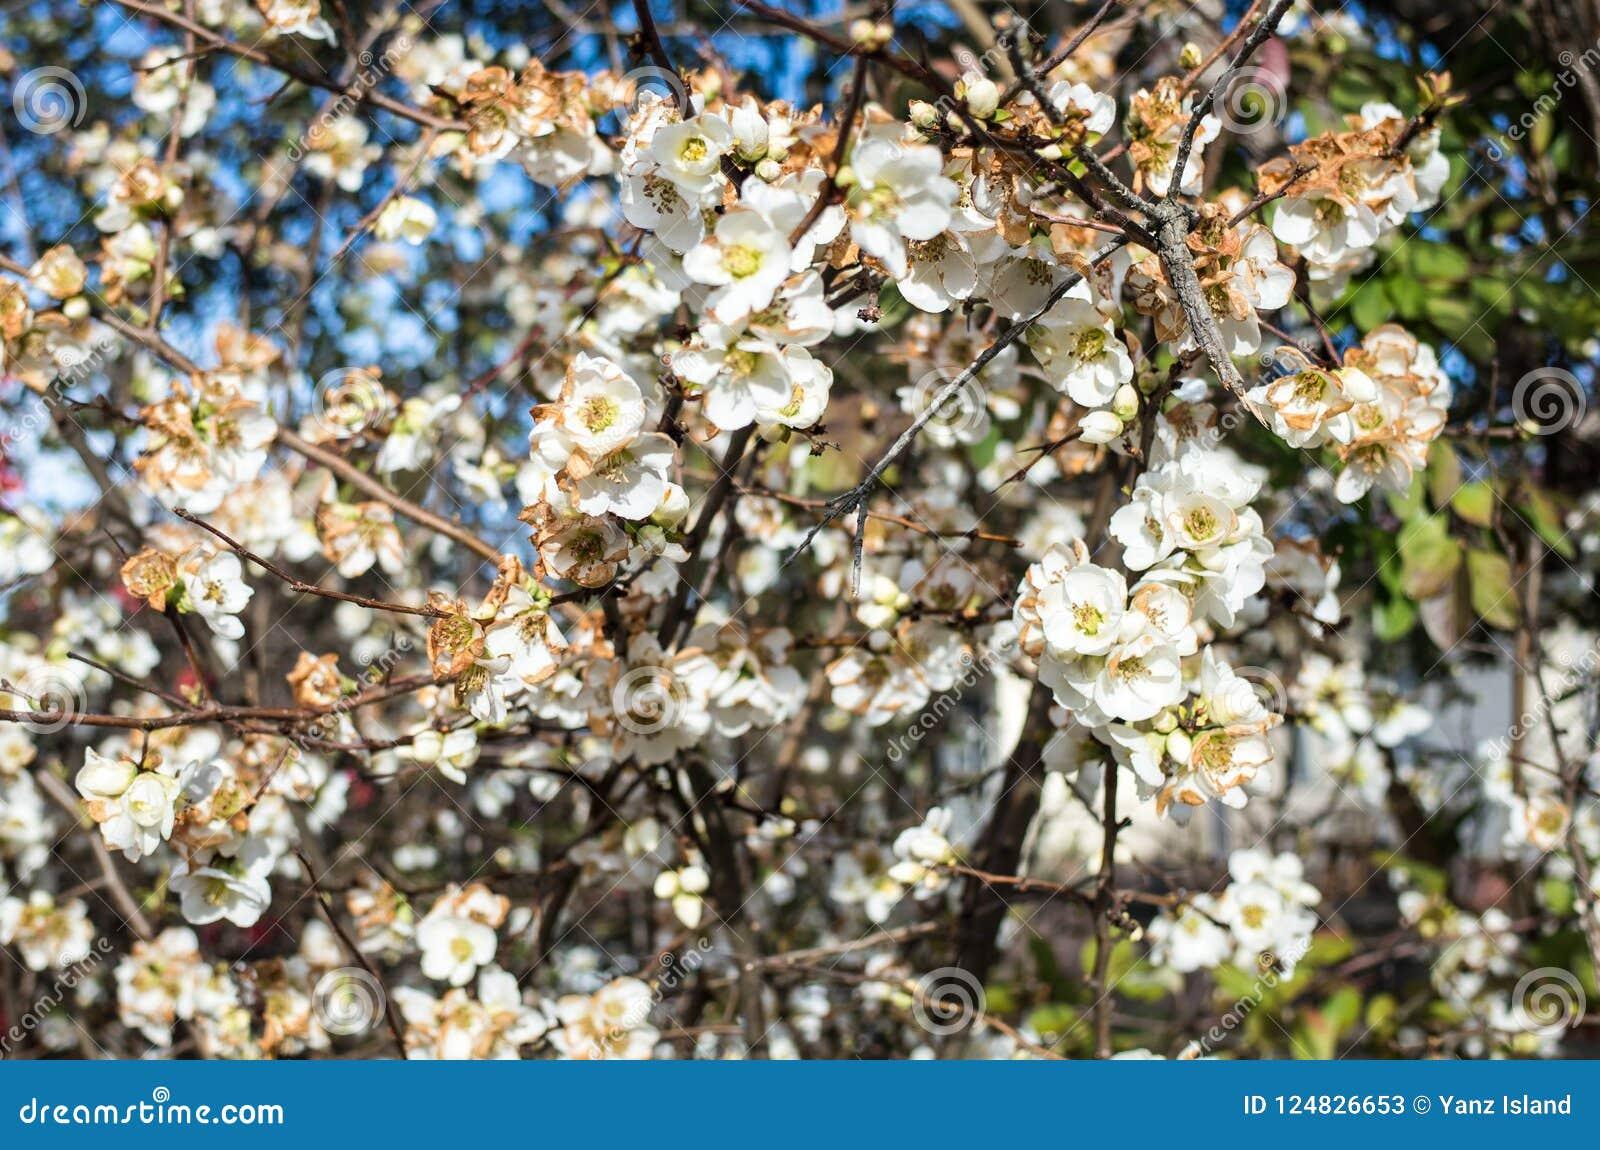 Seasonal Spring Flowers Trees Background April Stock Image Image